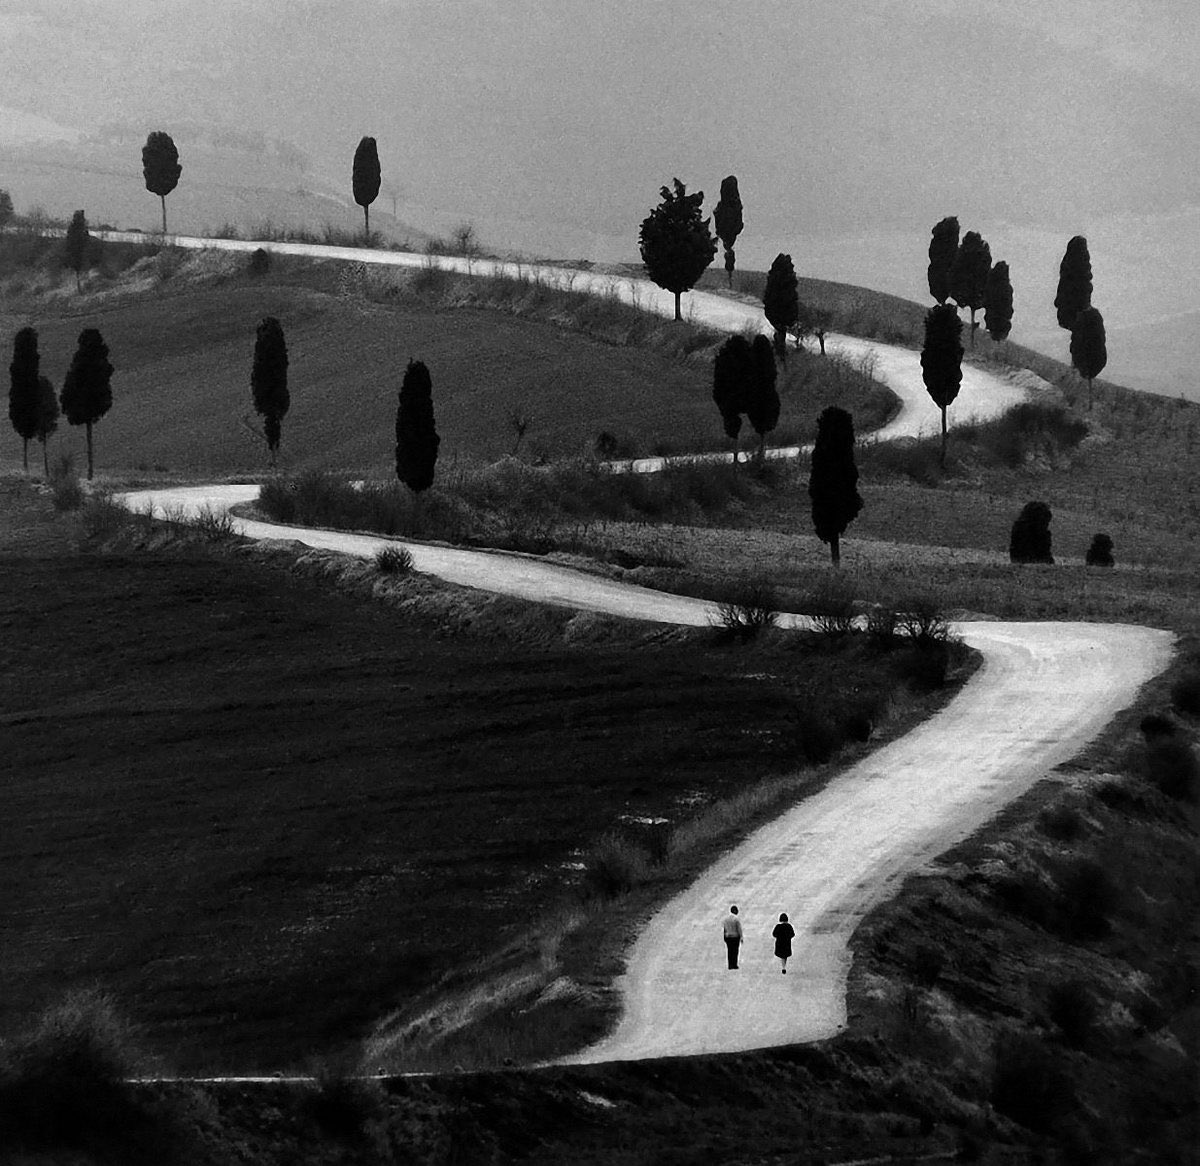 """ Marcher sans rien atteindre jusqu'à devenir chemin ""  Anise Koltz   Berengo Gardin https://t.co/101bzFw77I"